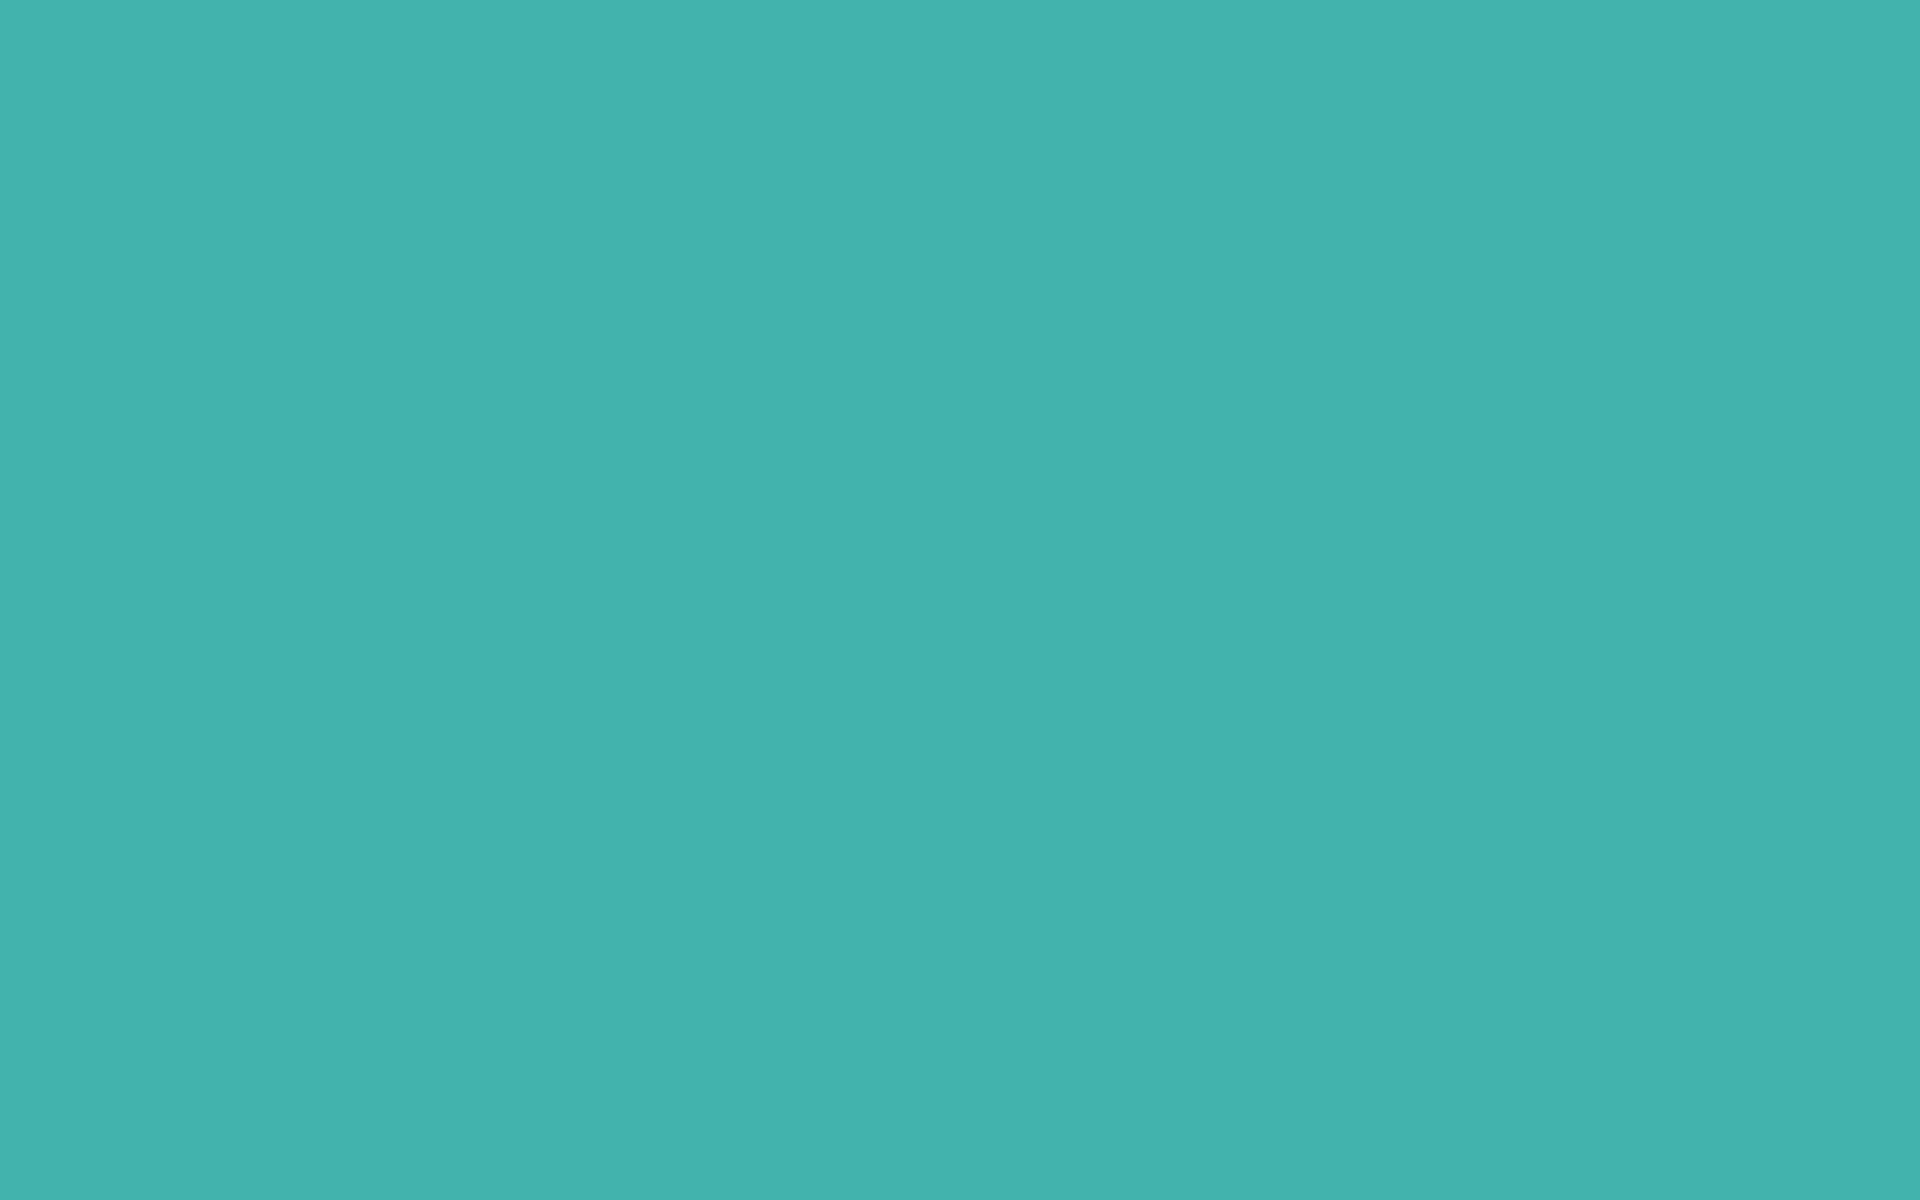 1920x1200 Verdigris Solid Color Background